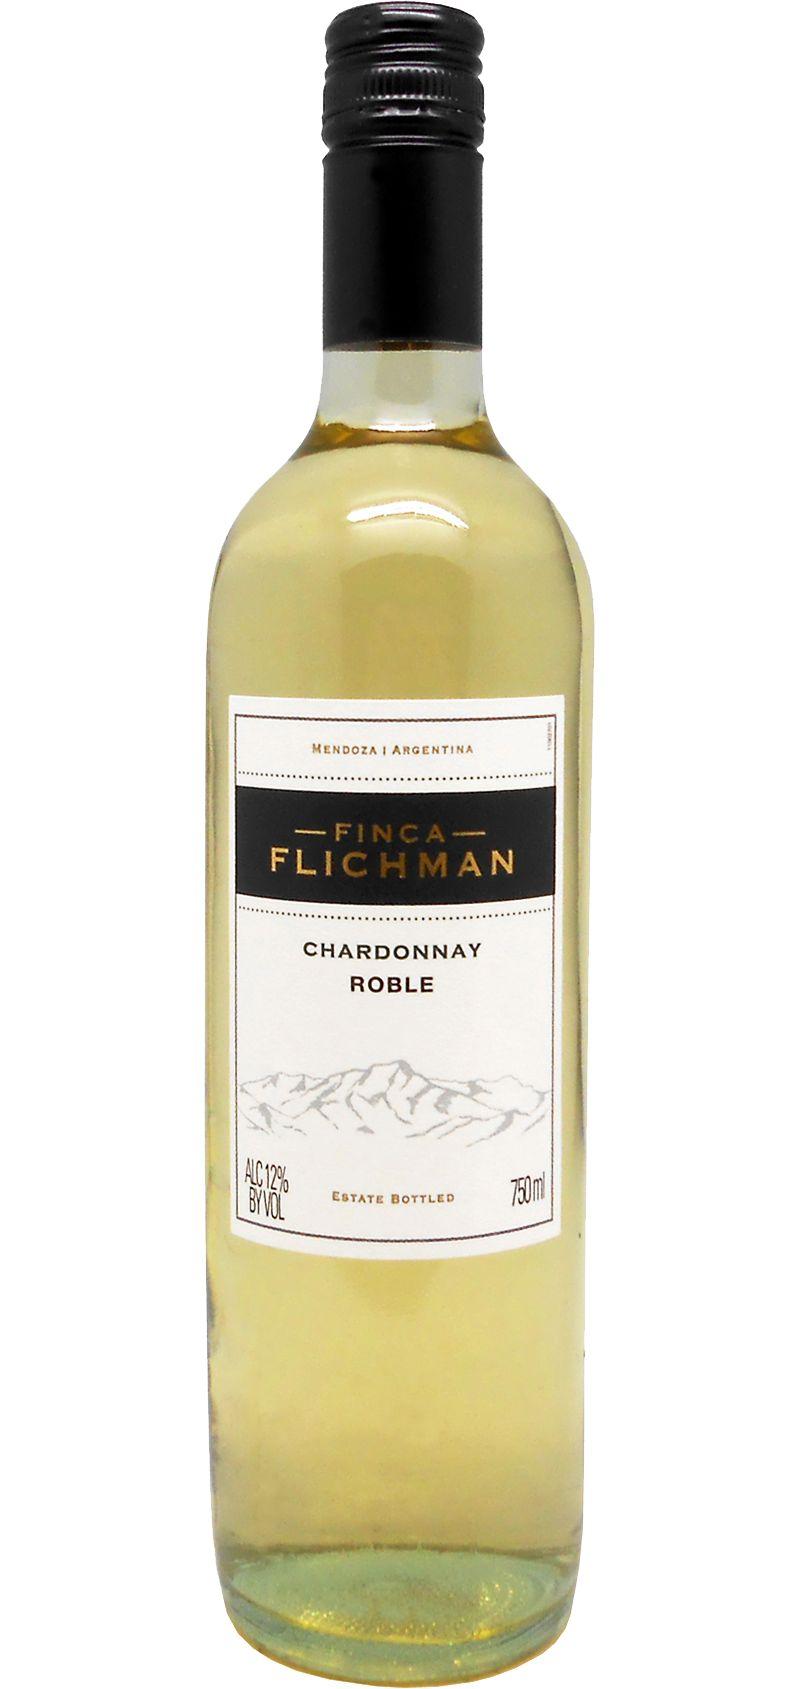 Finca Flichman Roble Chardonnay